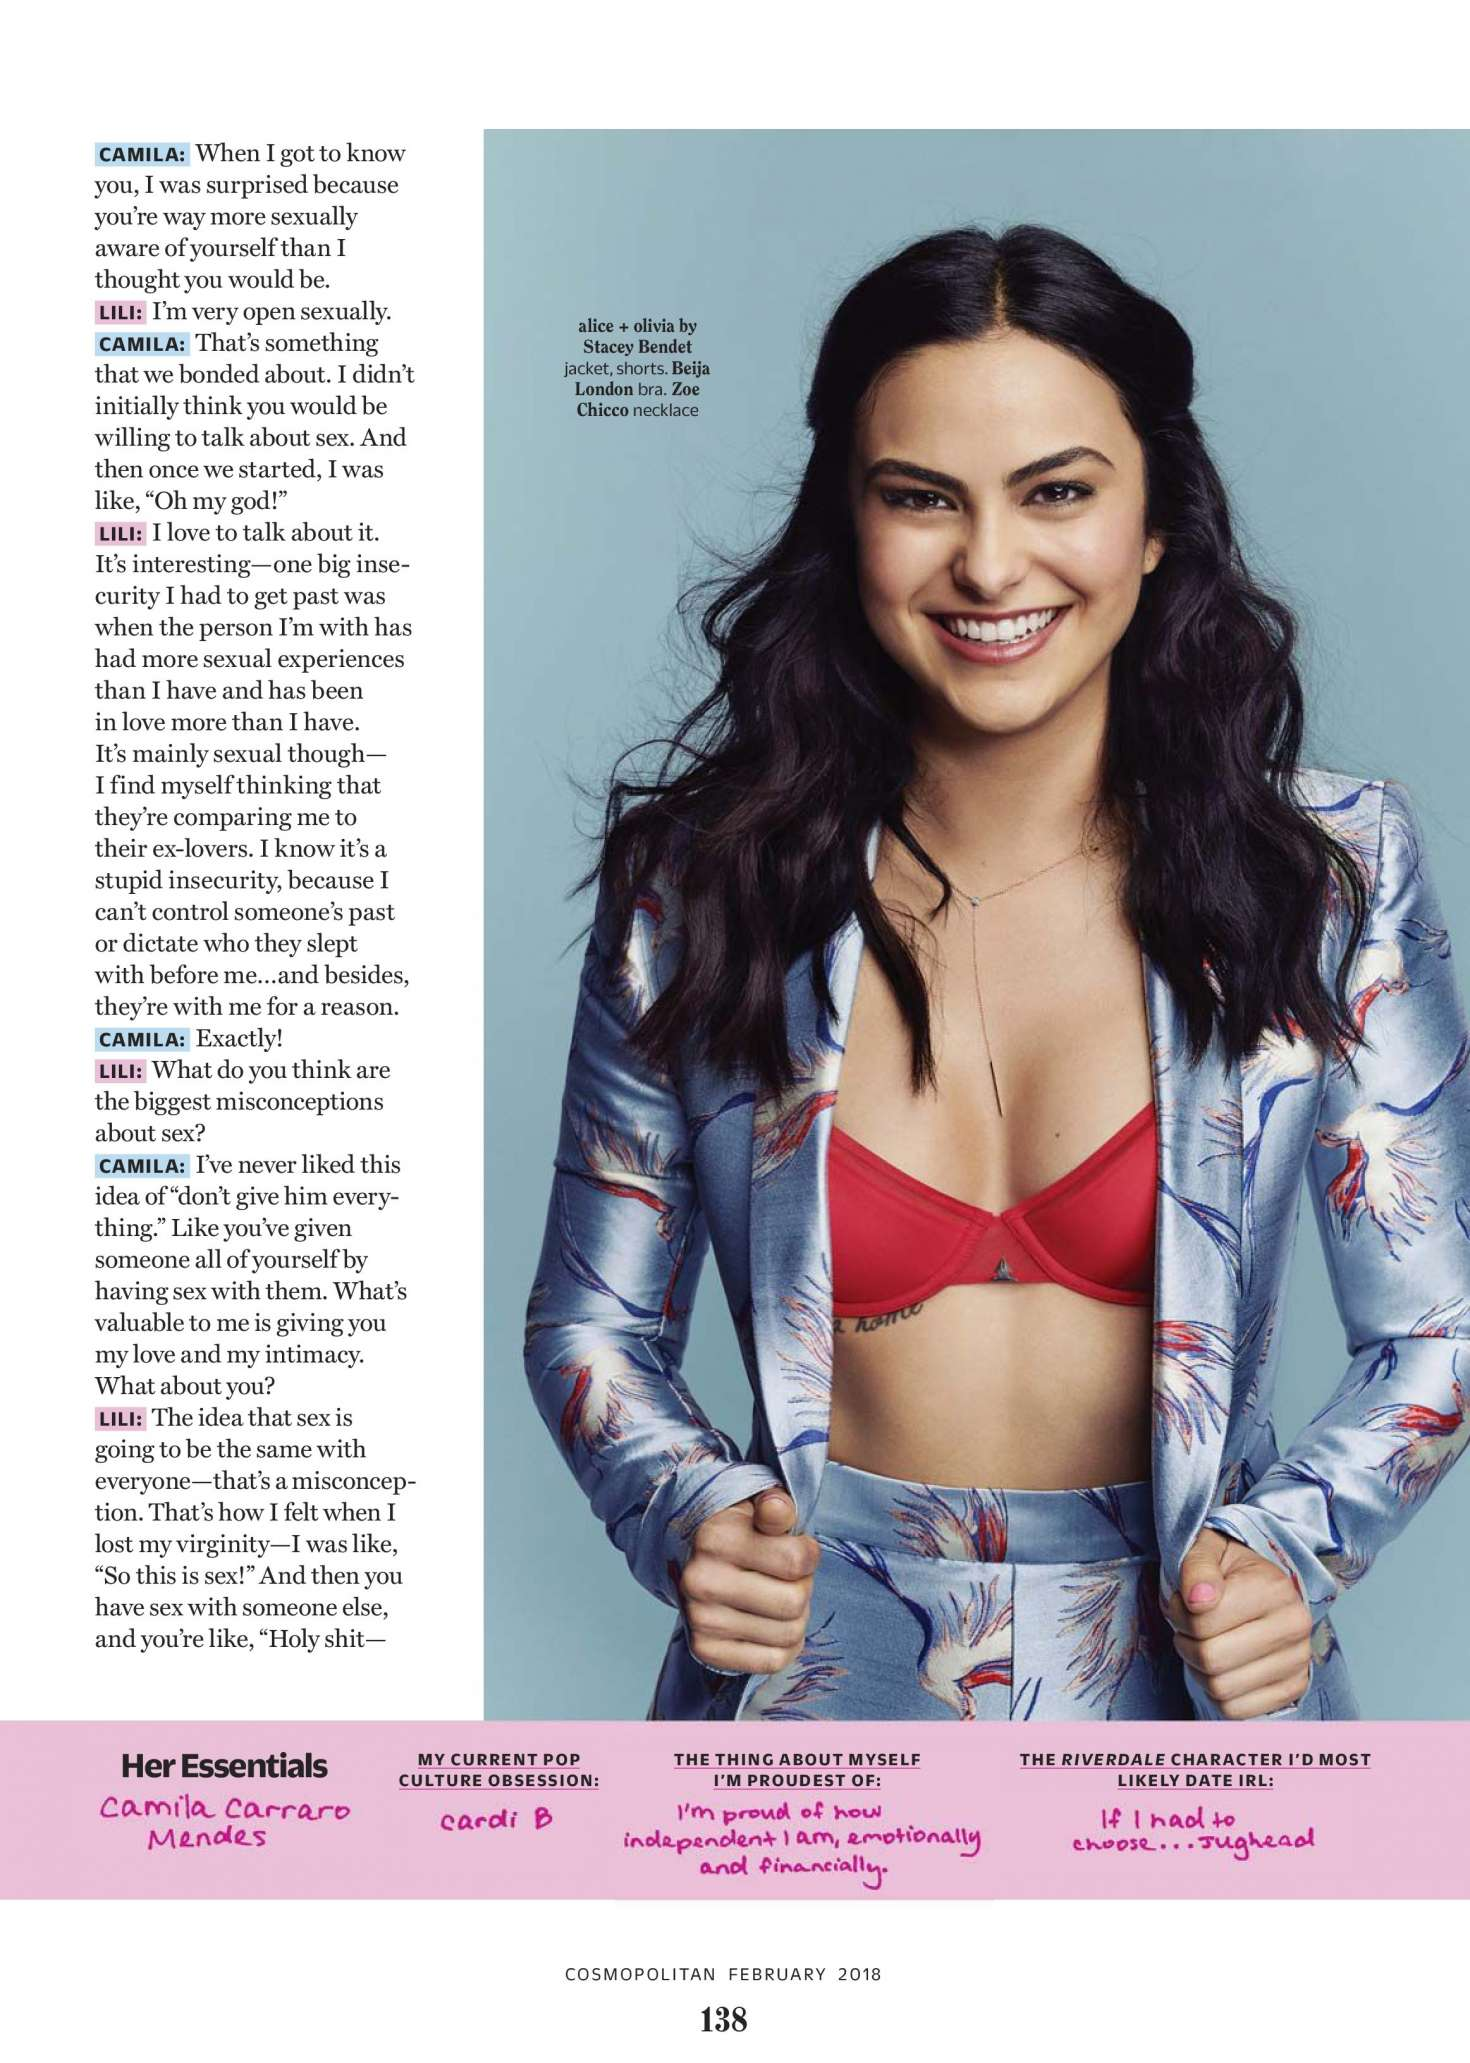 Camila Mendes - Cosmopolitan Magazine (February 2018)